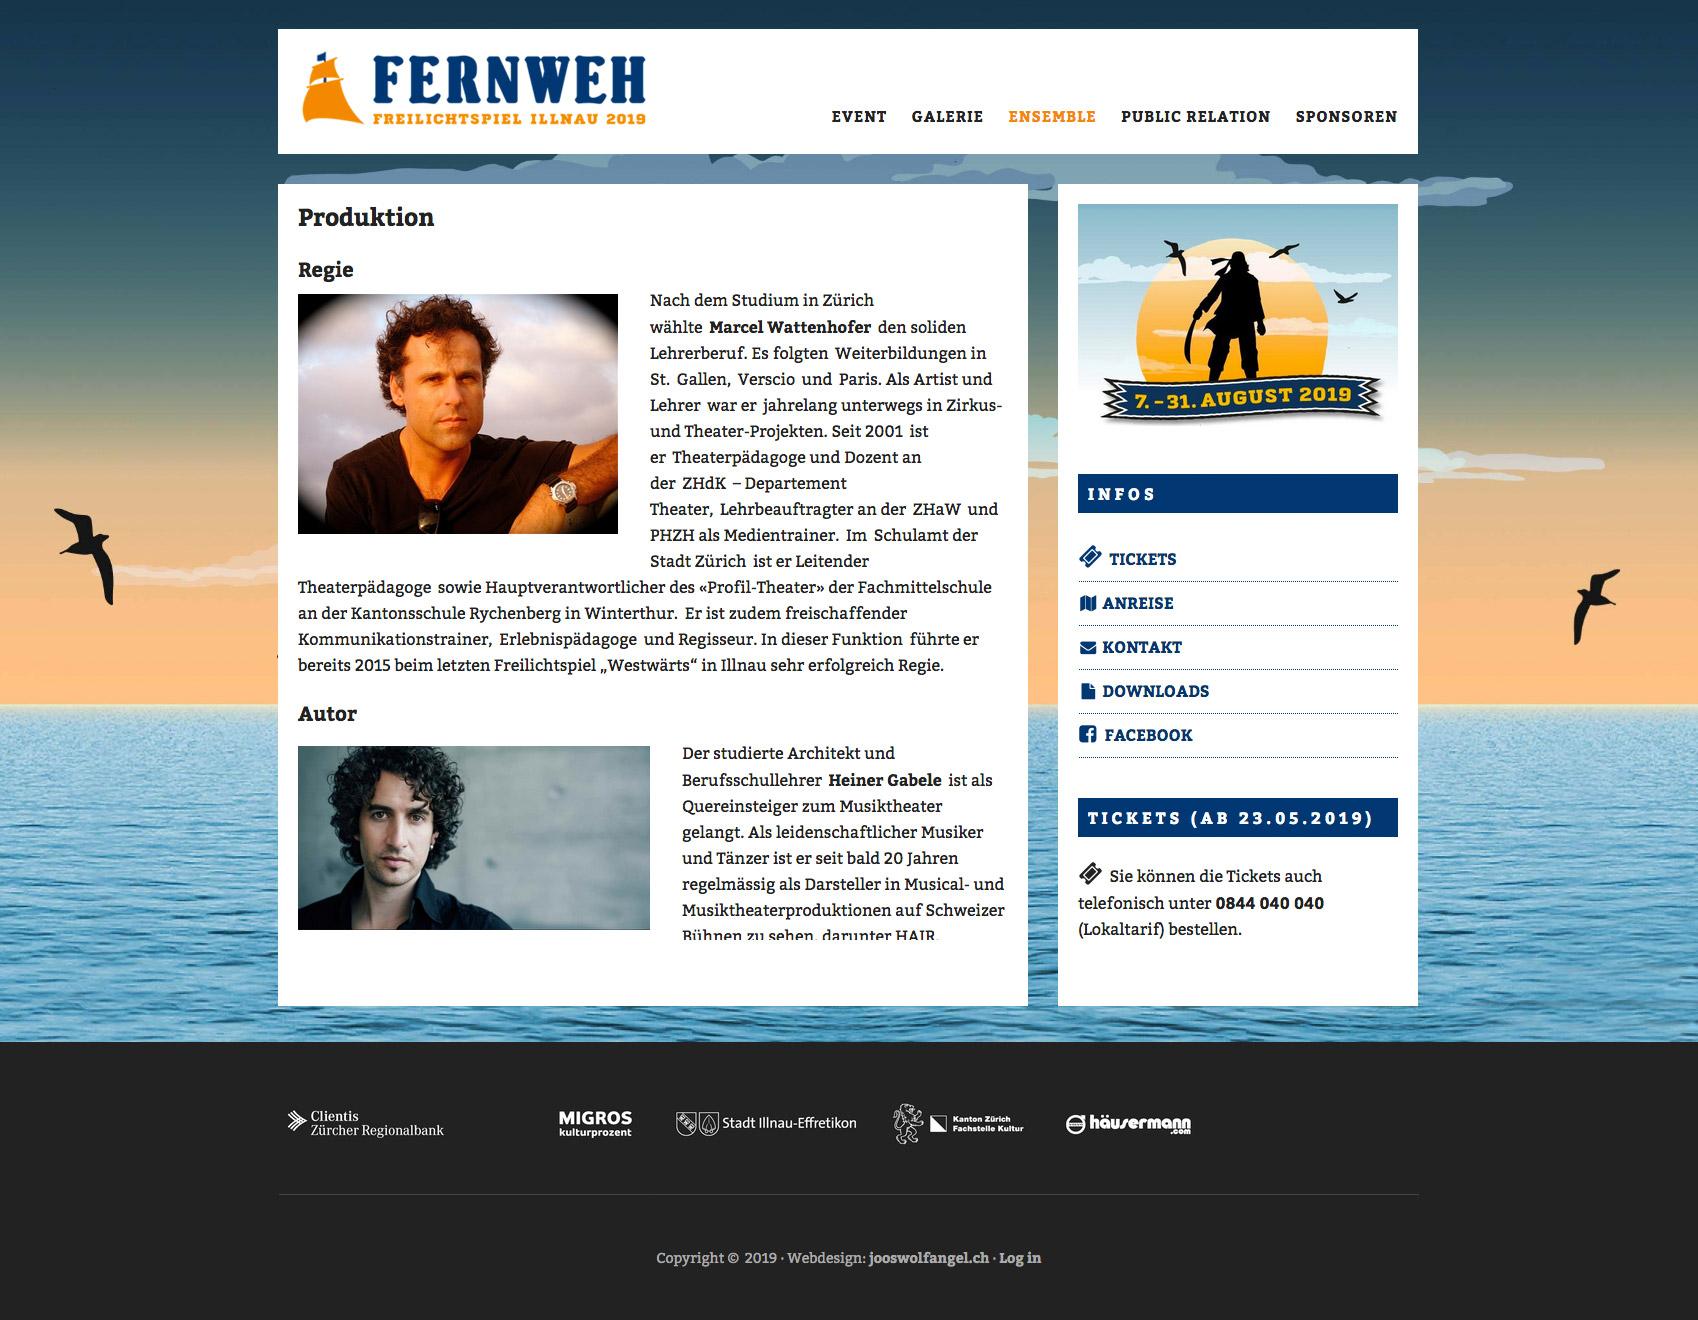 fernweh-produktion.jpg